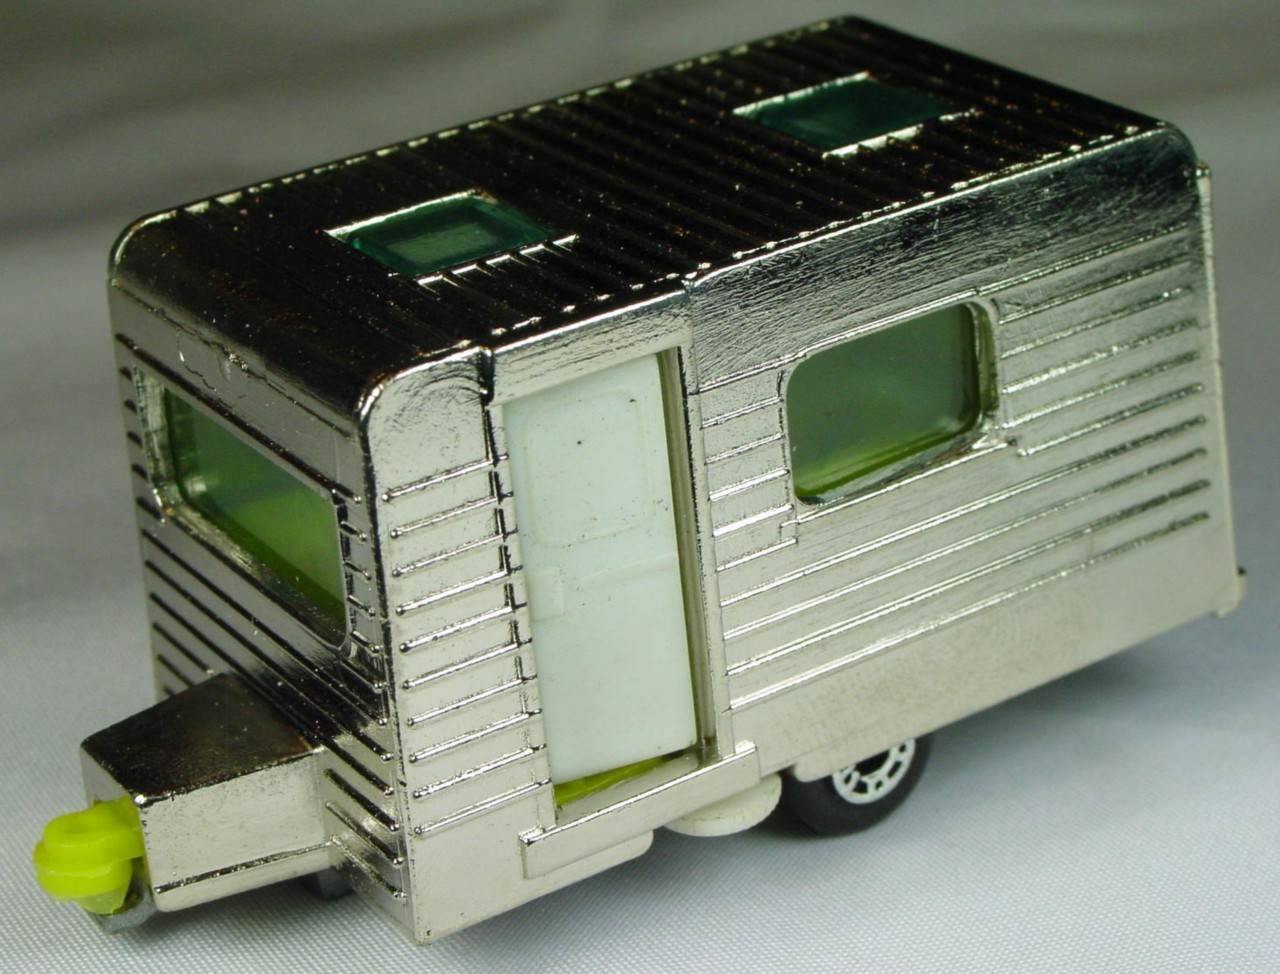 Bulgarian 31 C - Caravan Chrome yellow interior white door met sil-grey base